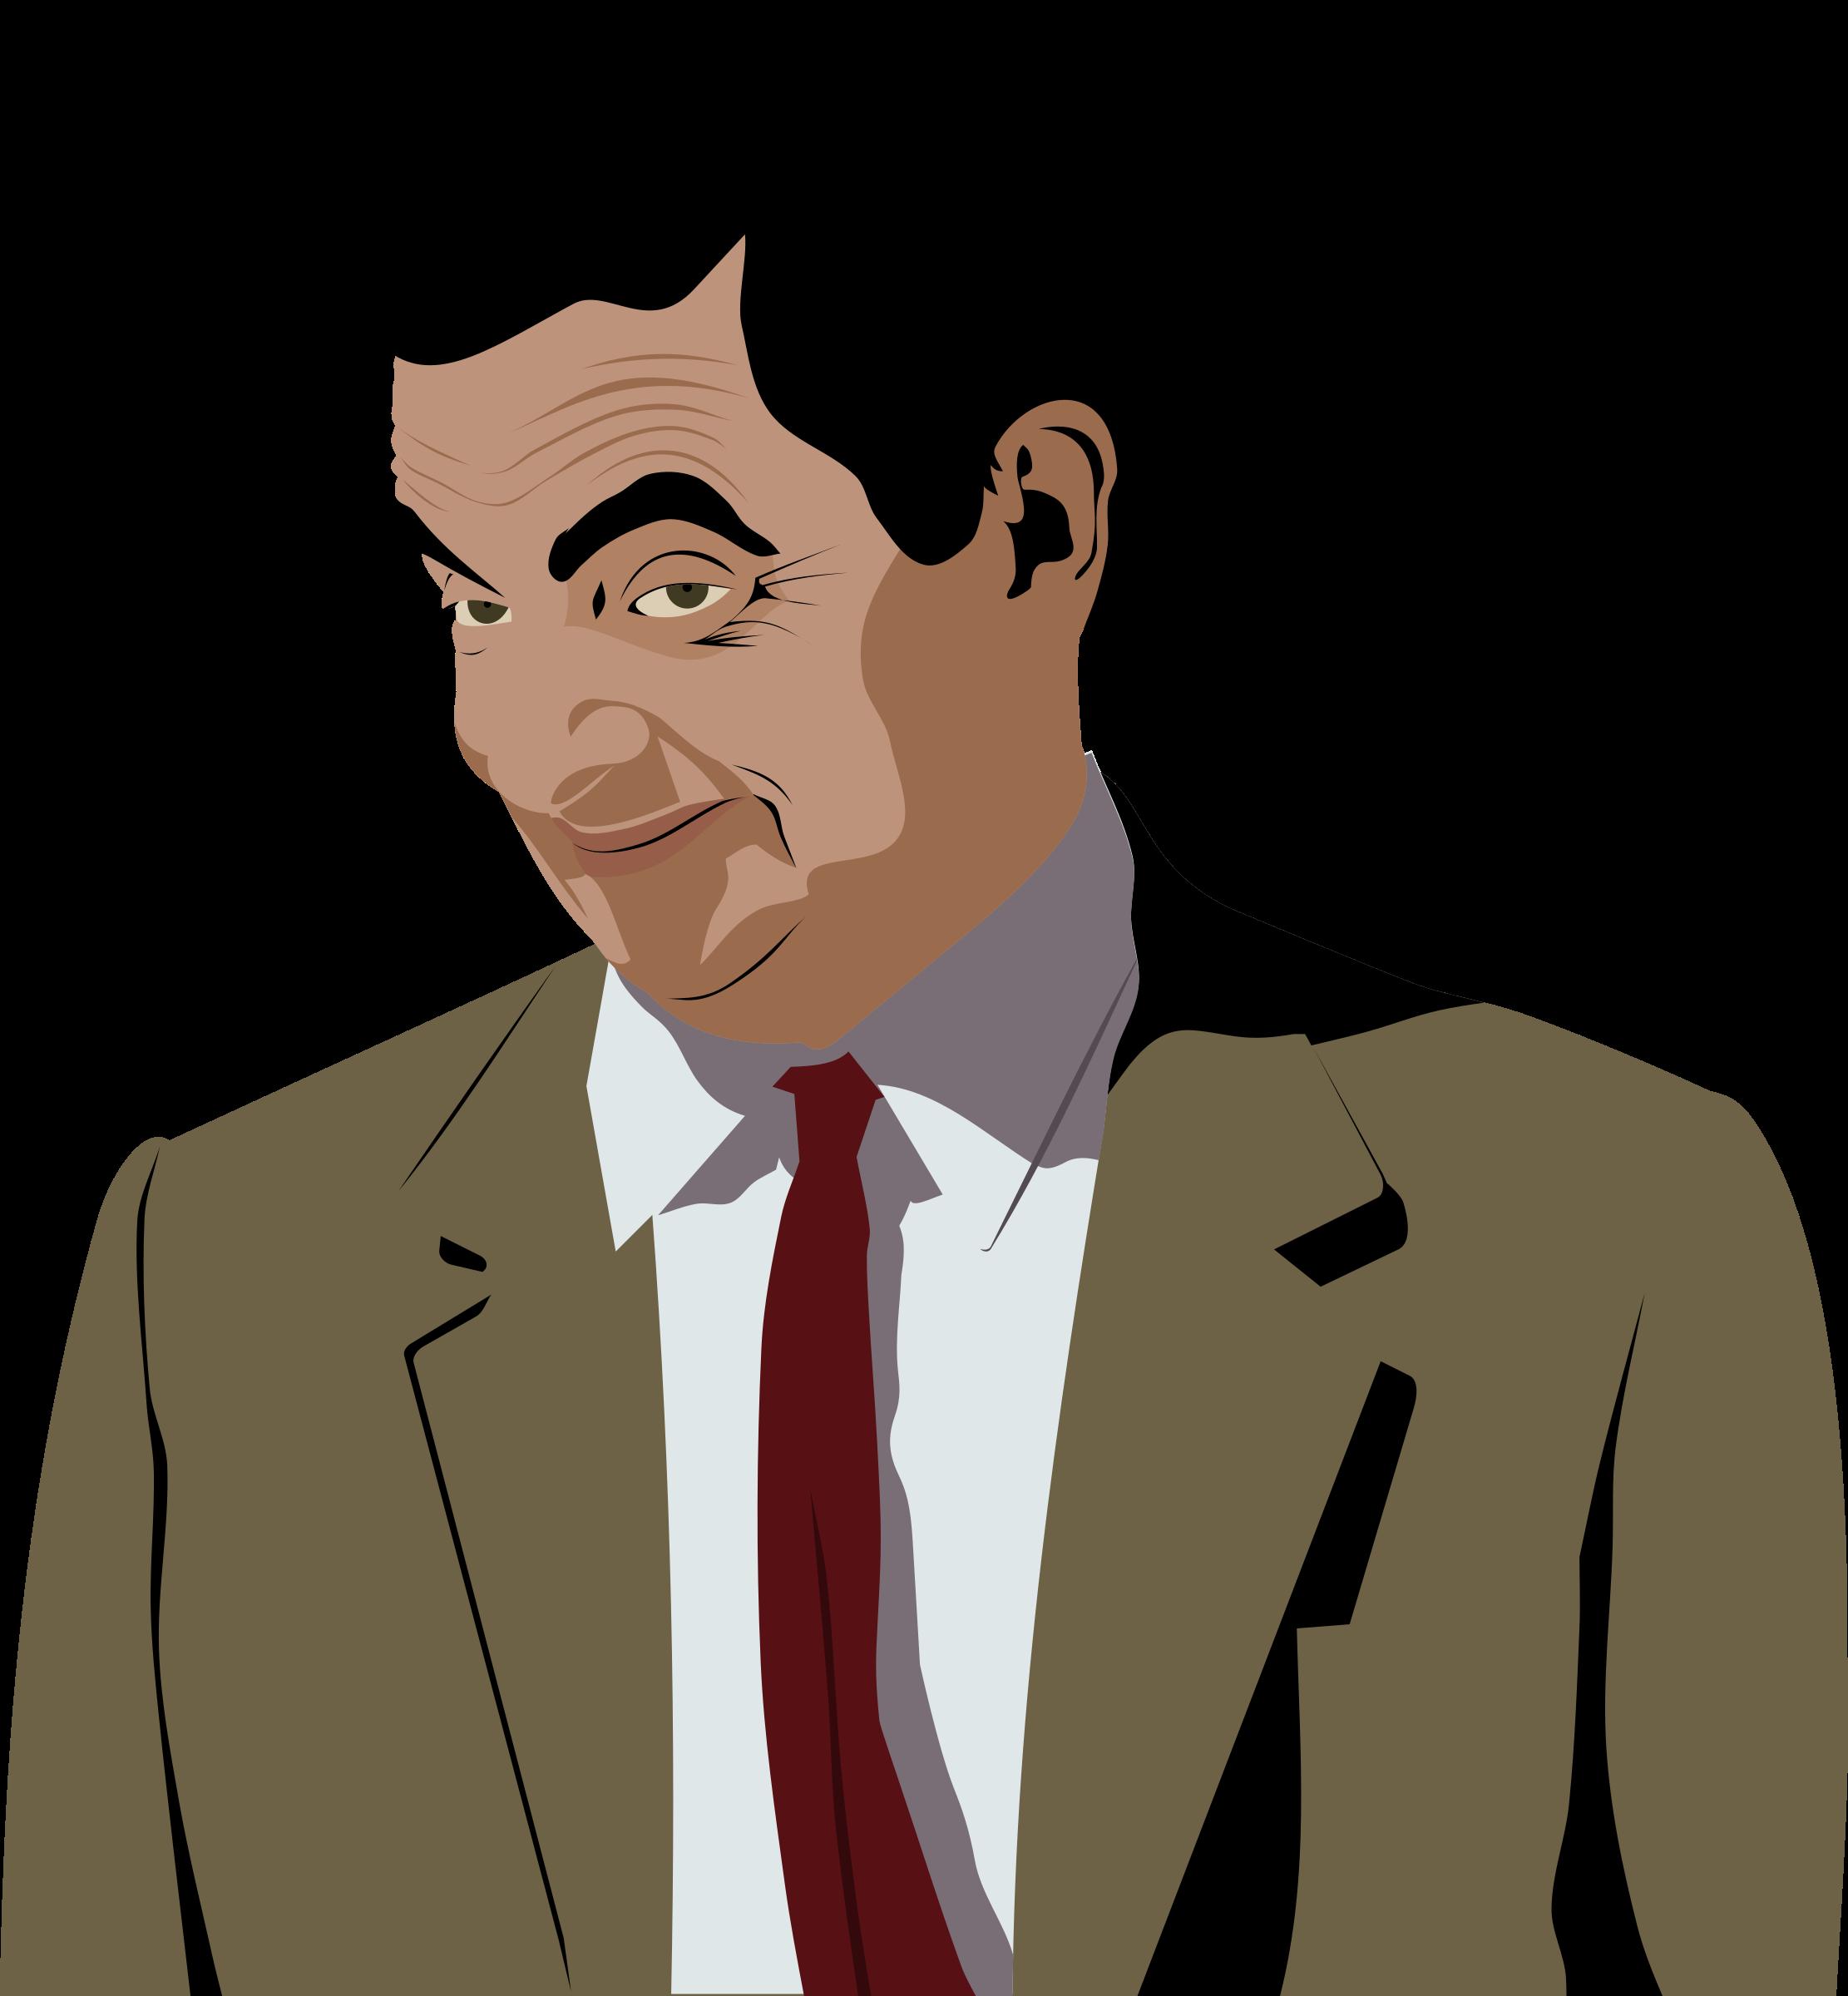 Rowan Atkinson PNG Image